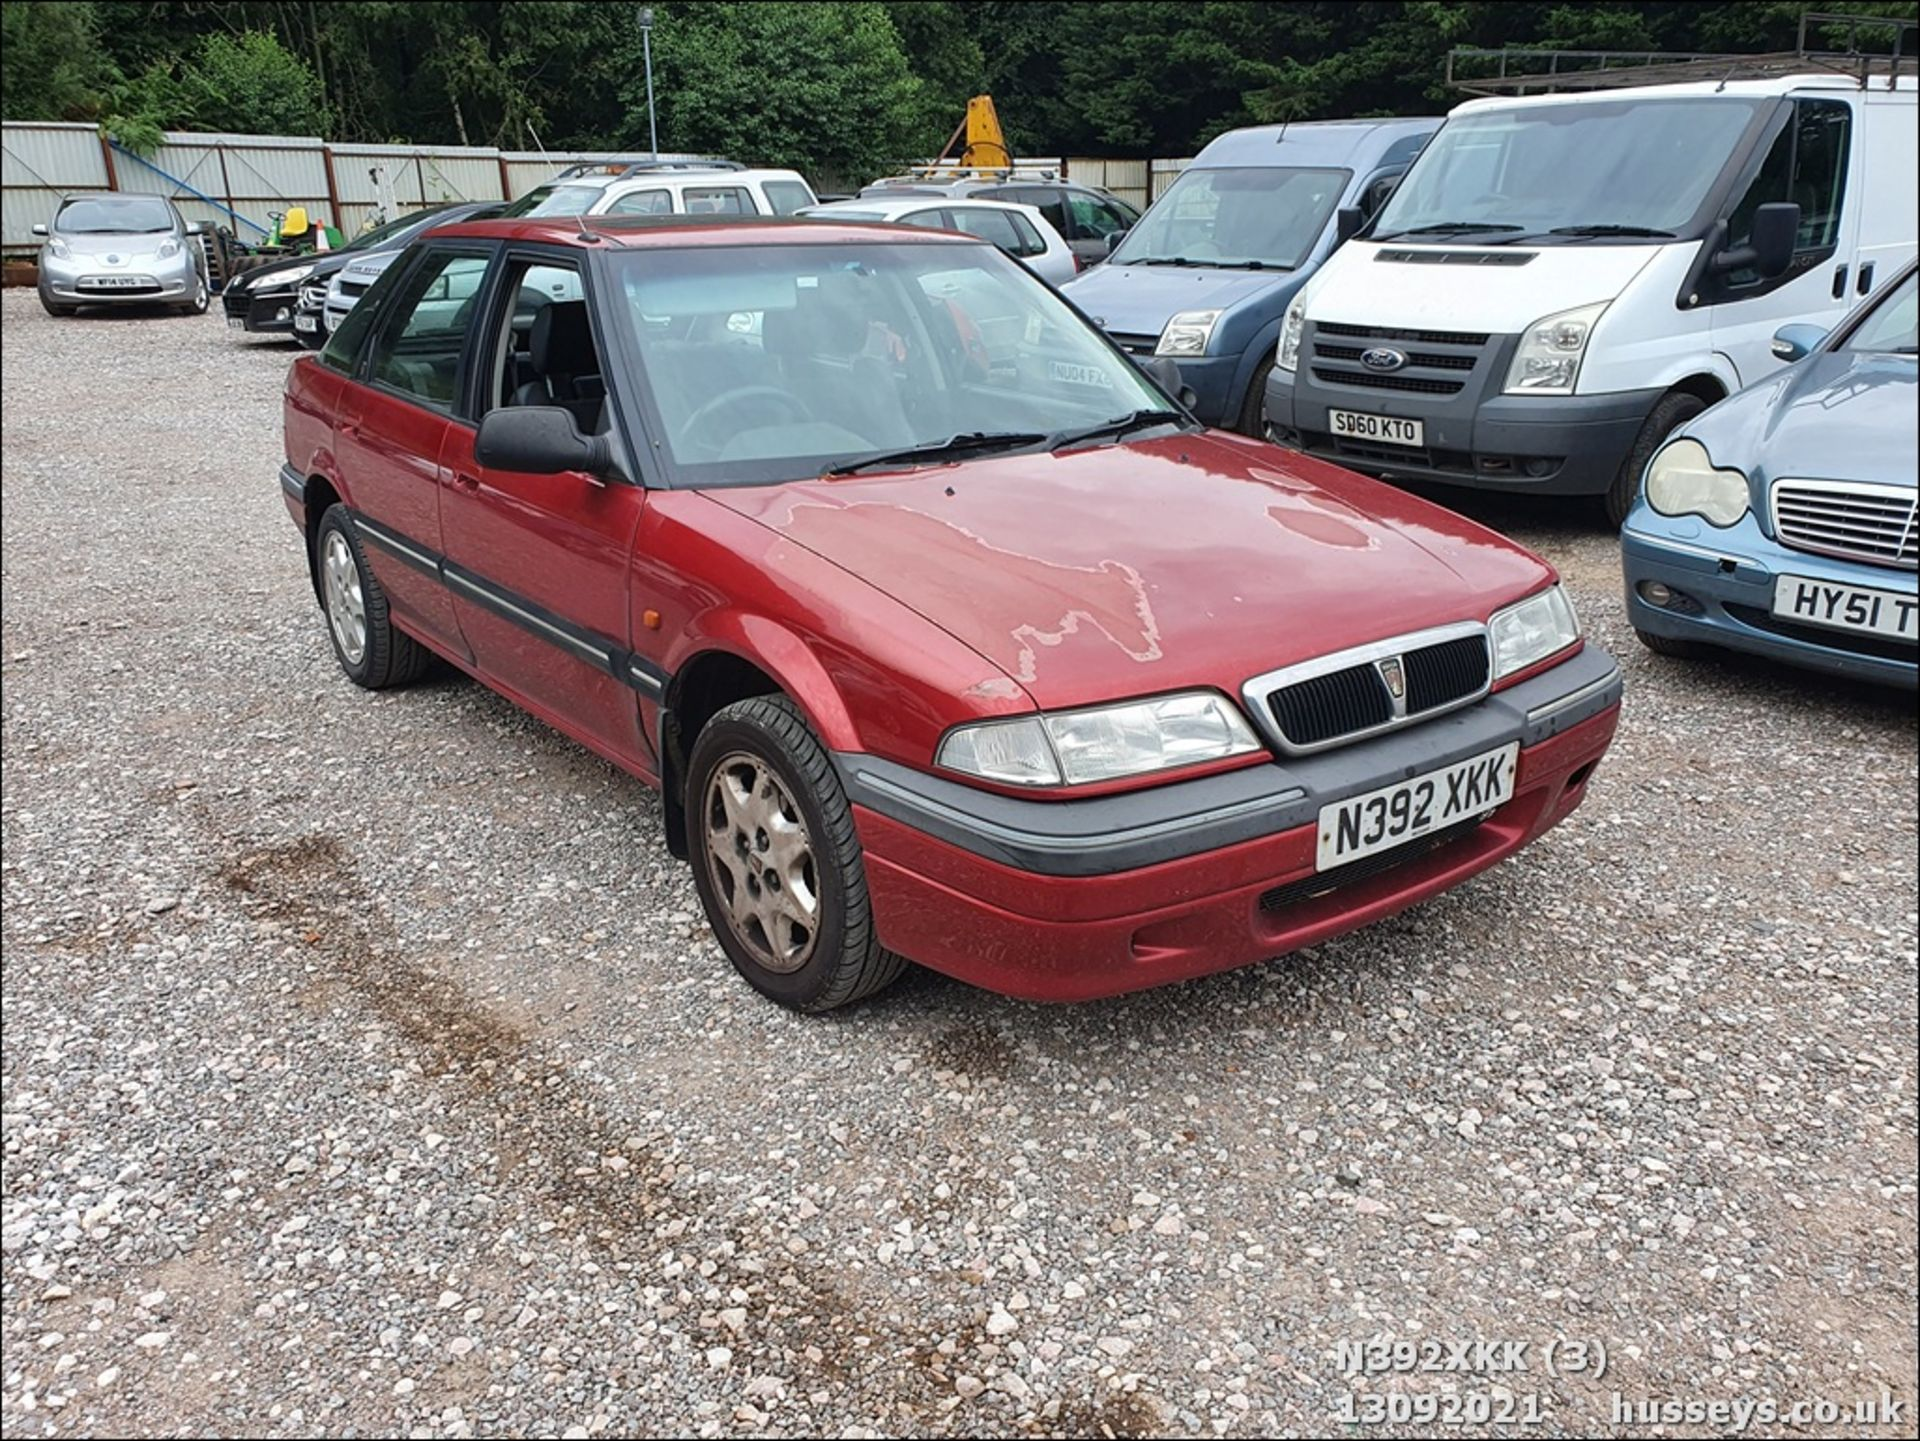 1995 ROVER 214 SEI - 1396cc 5dr Hatchback (Red, 99k) - Image 3 of 15